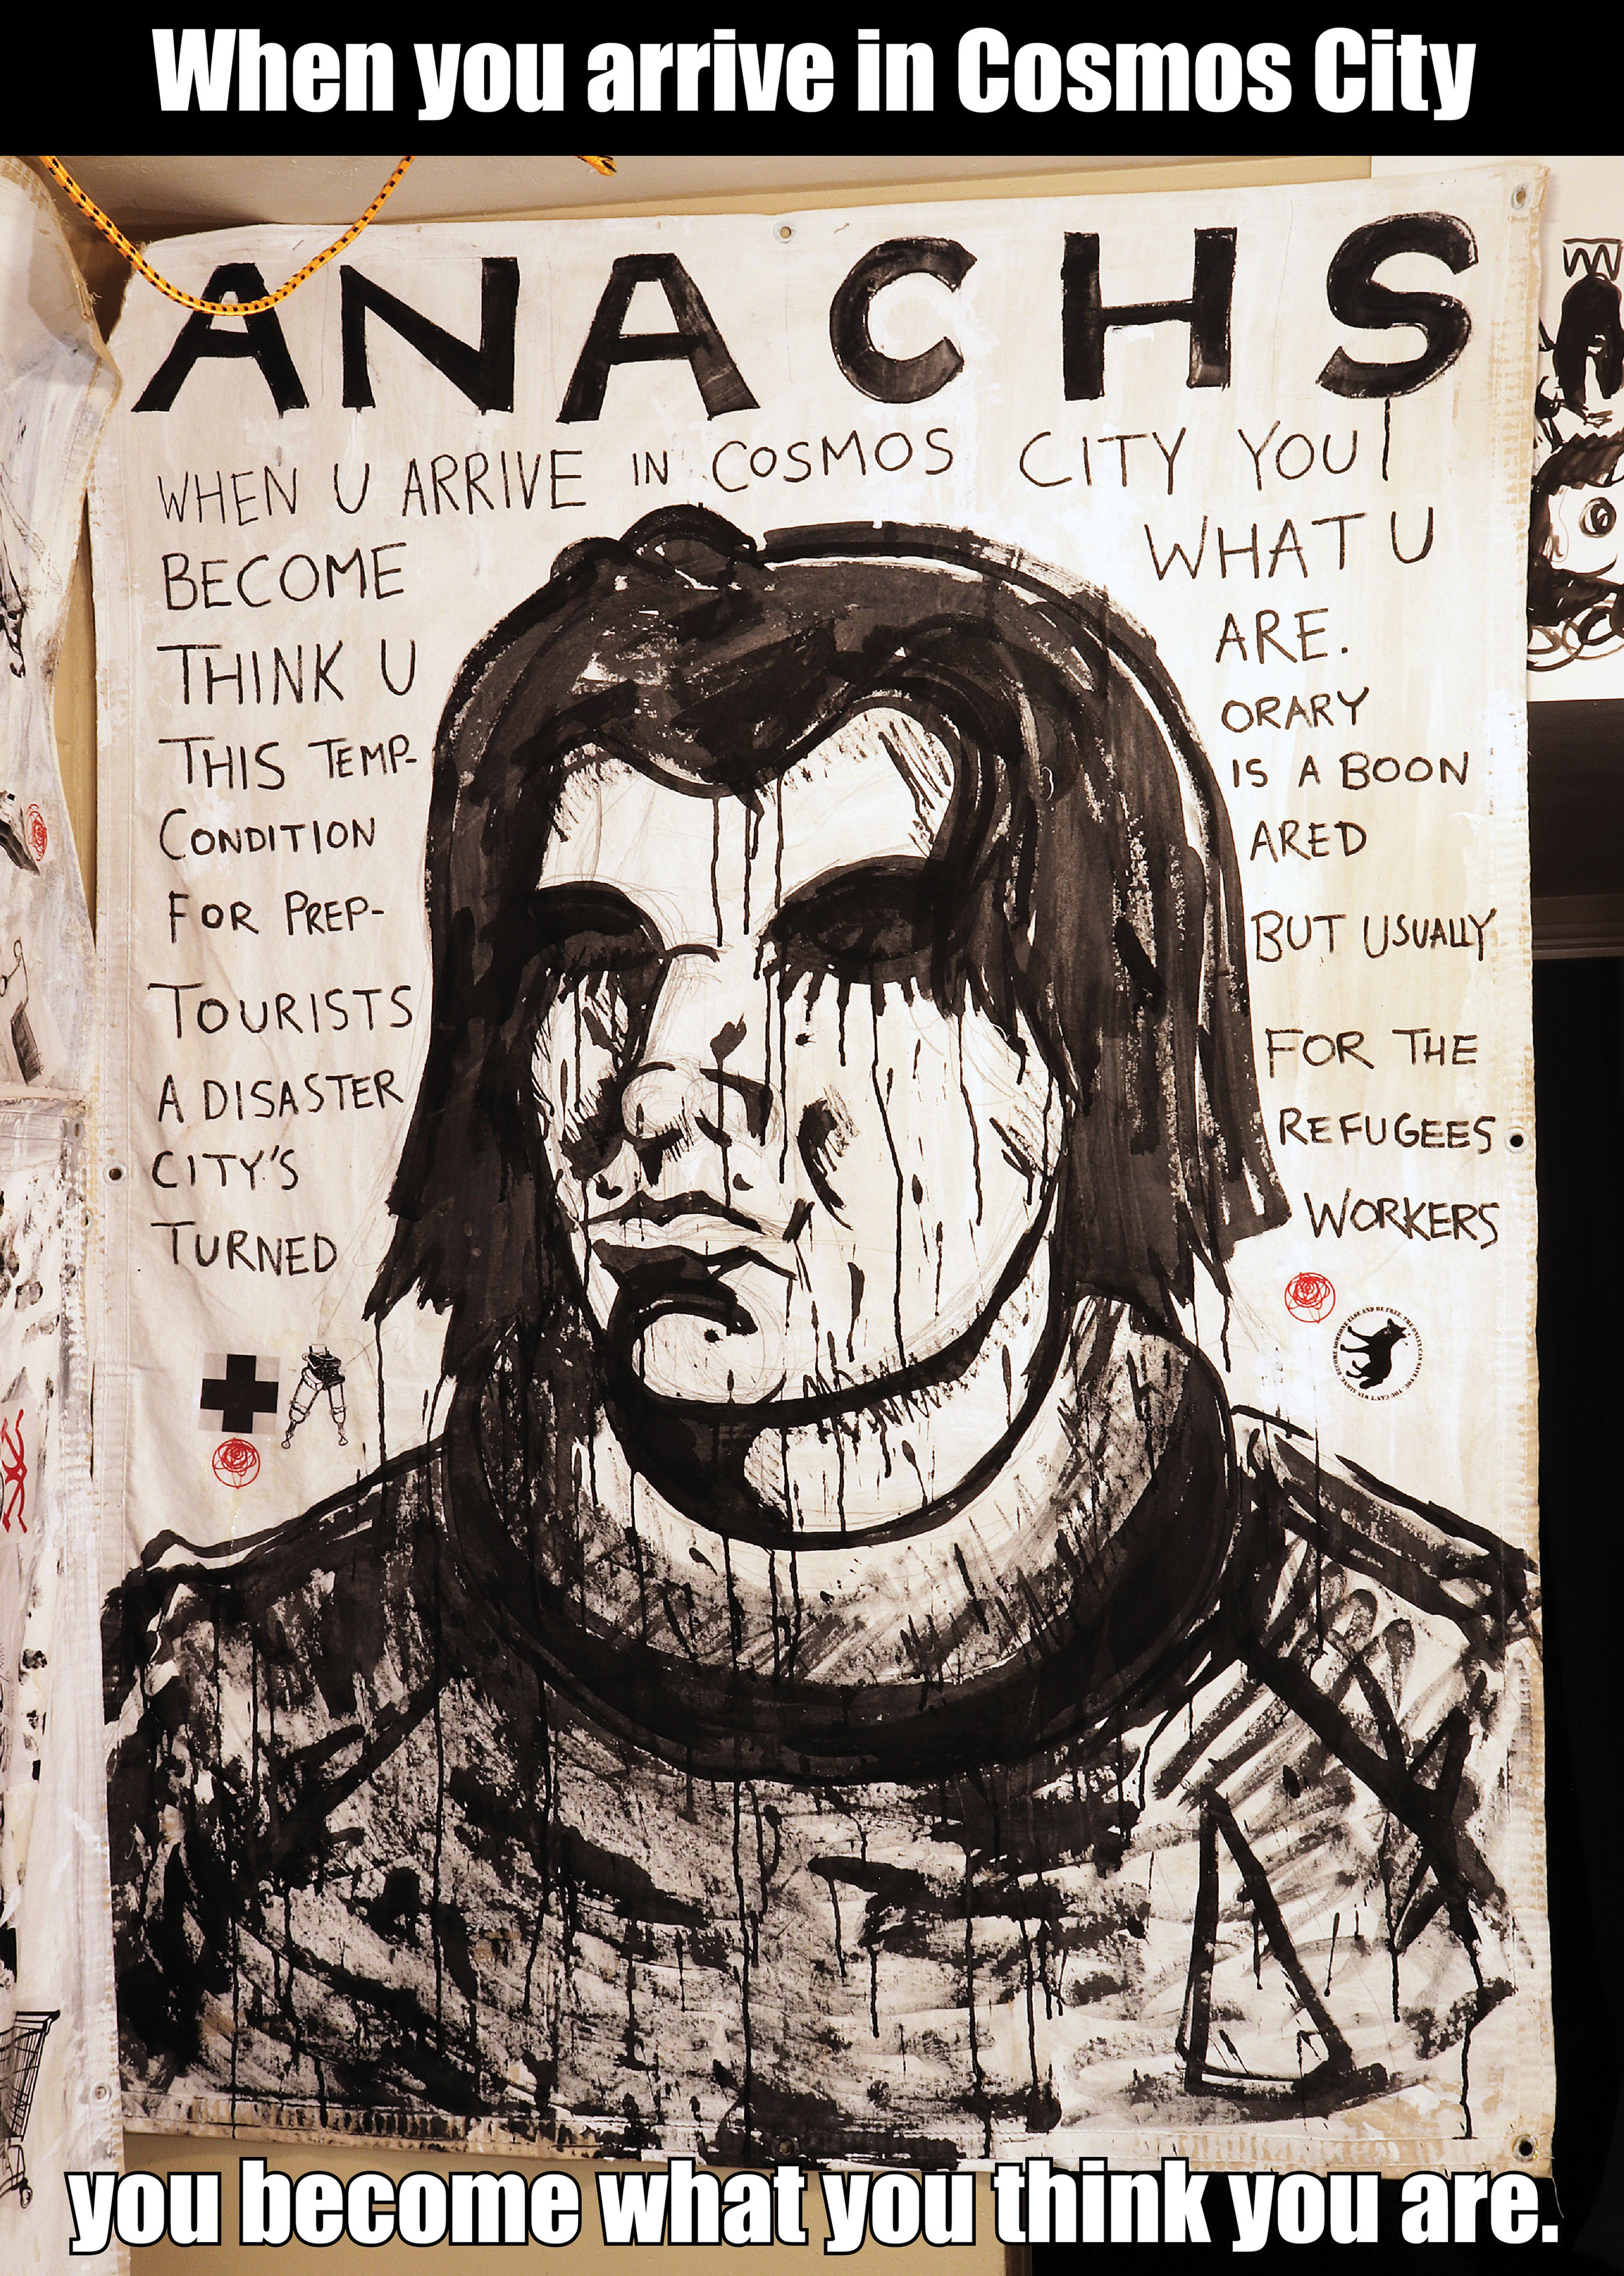 https://www.anachs.com/blog-1/anach-self